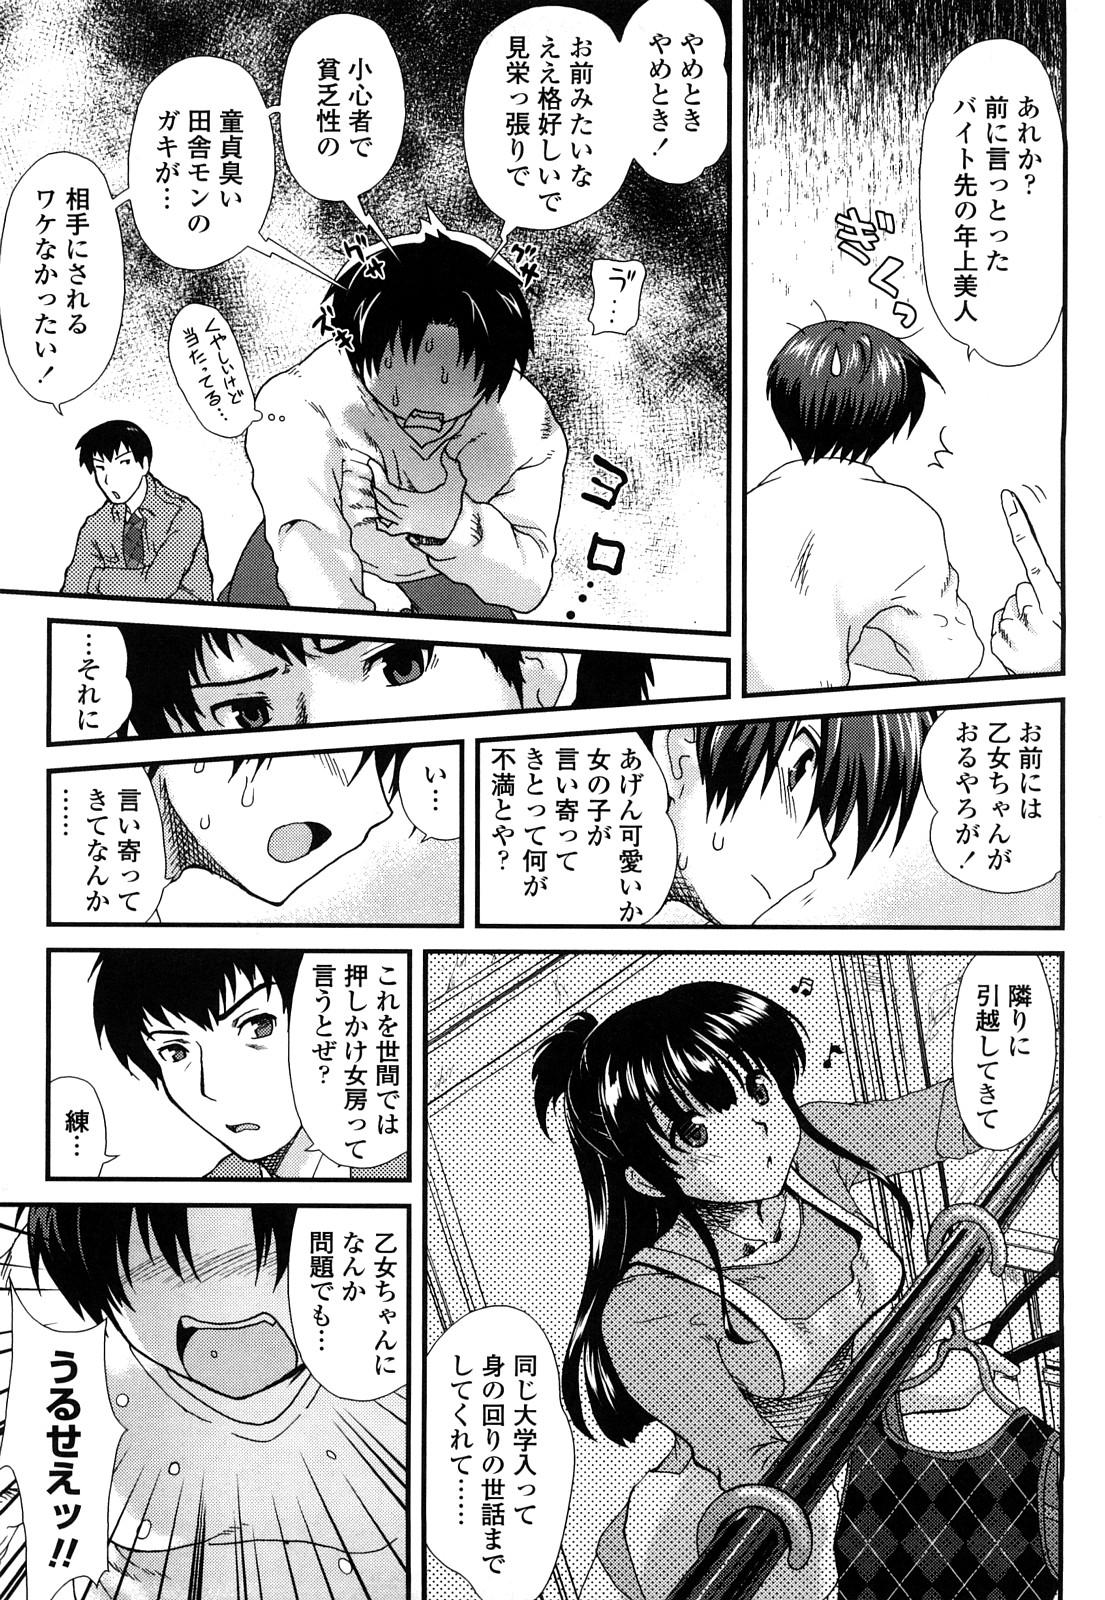 Ichigo Marble 31